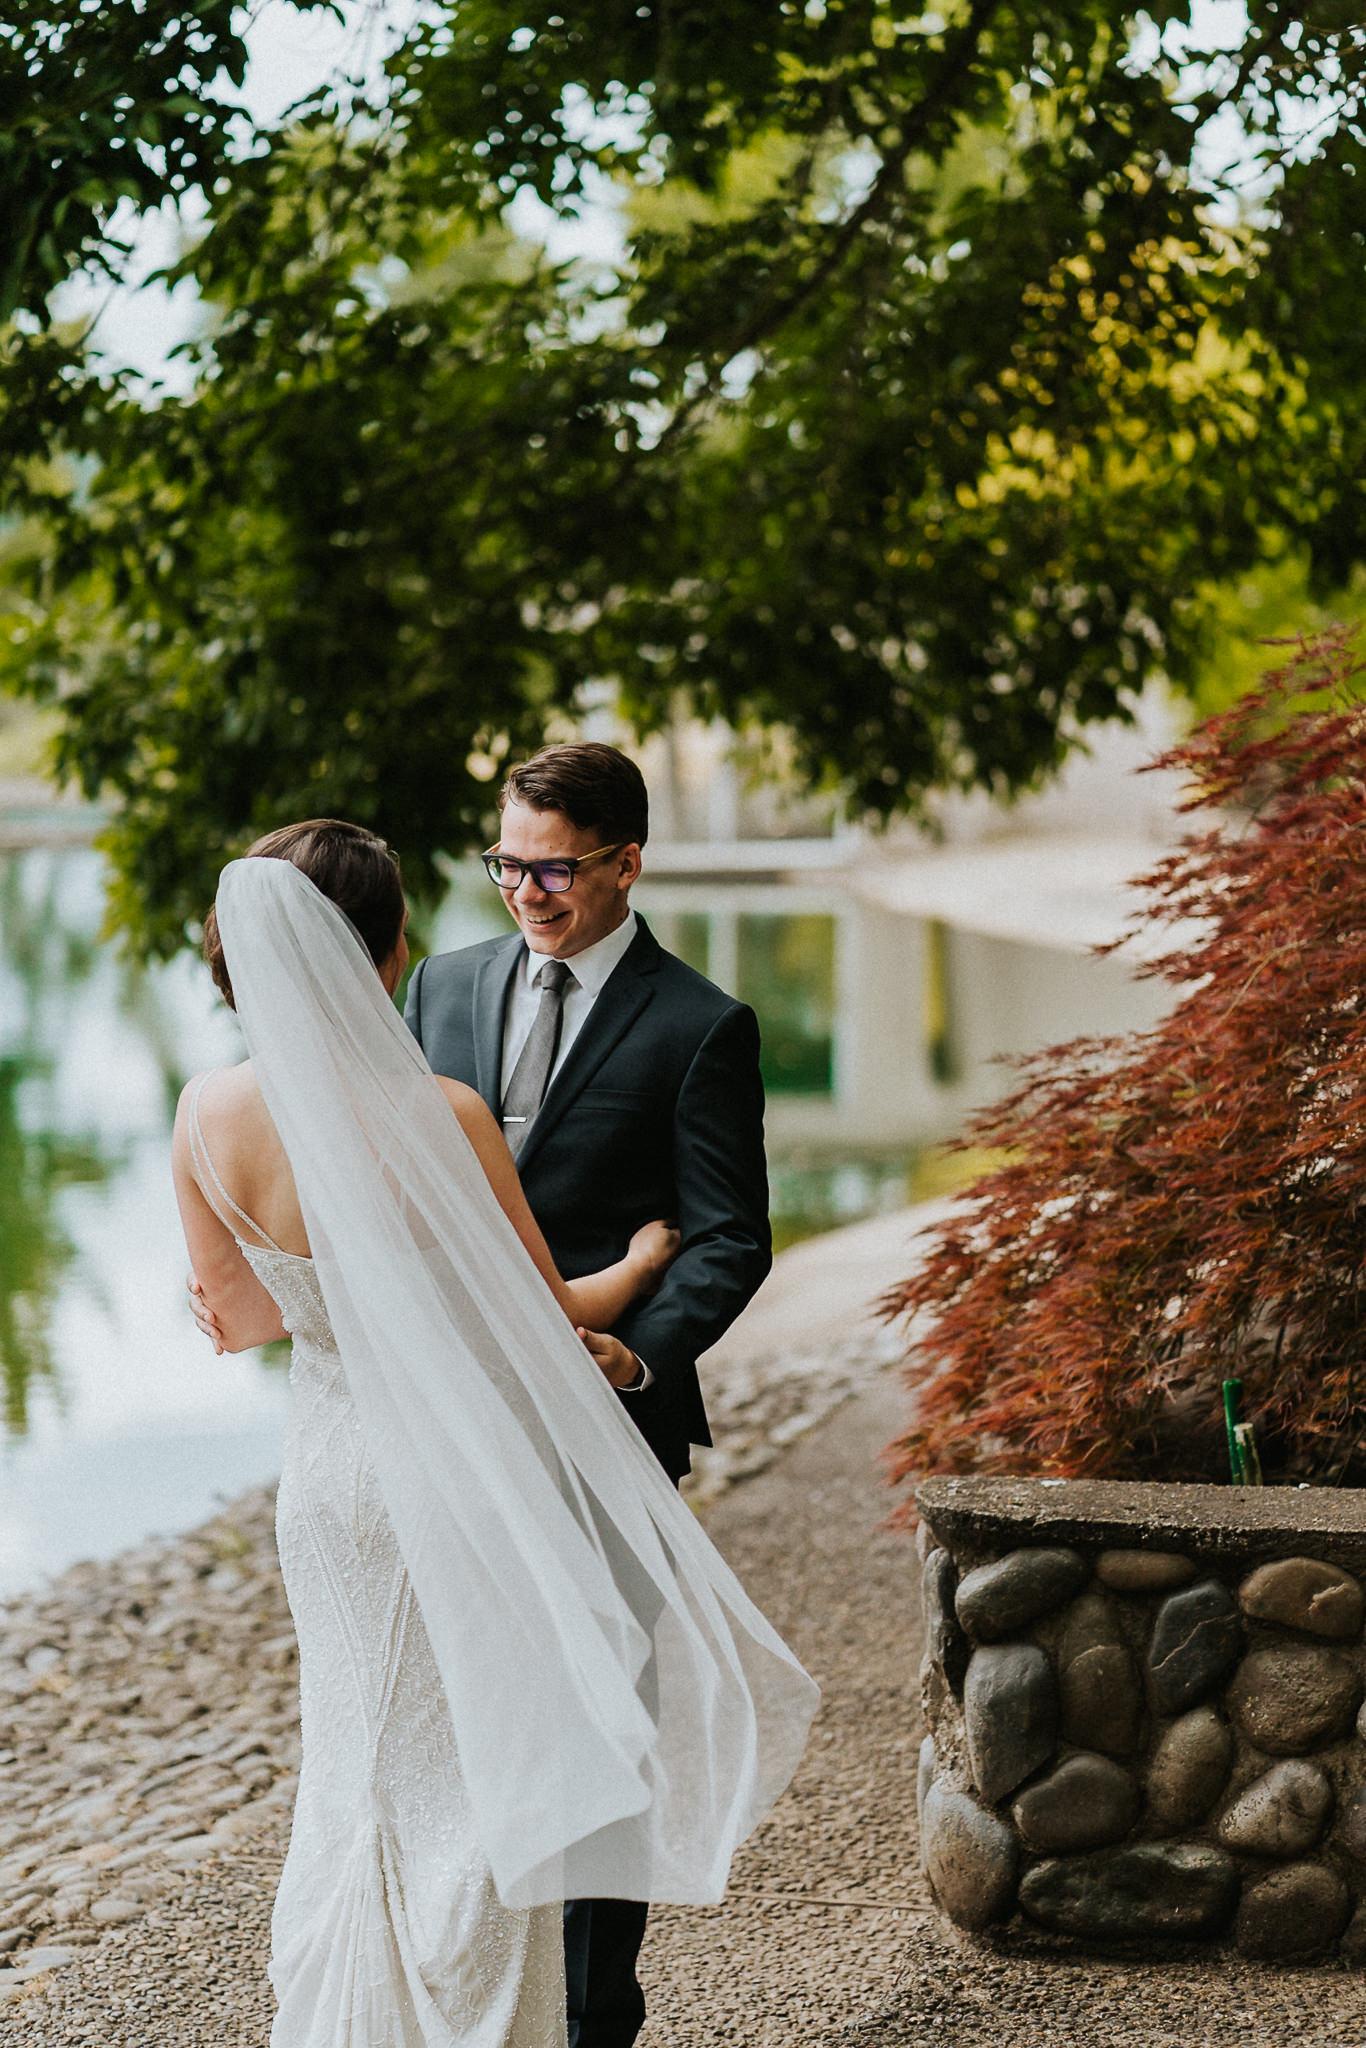 Hello Groom First Look Smile Bride Wedding Photographer